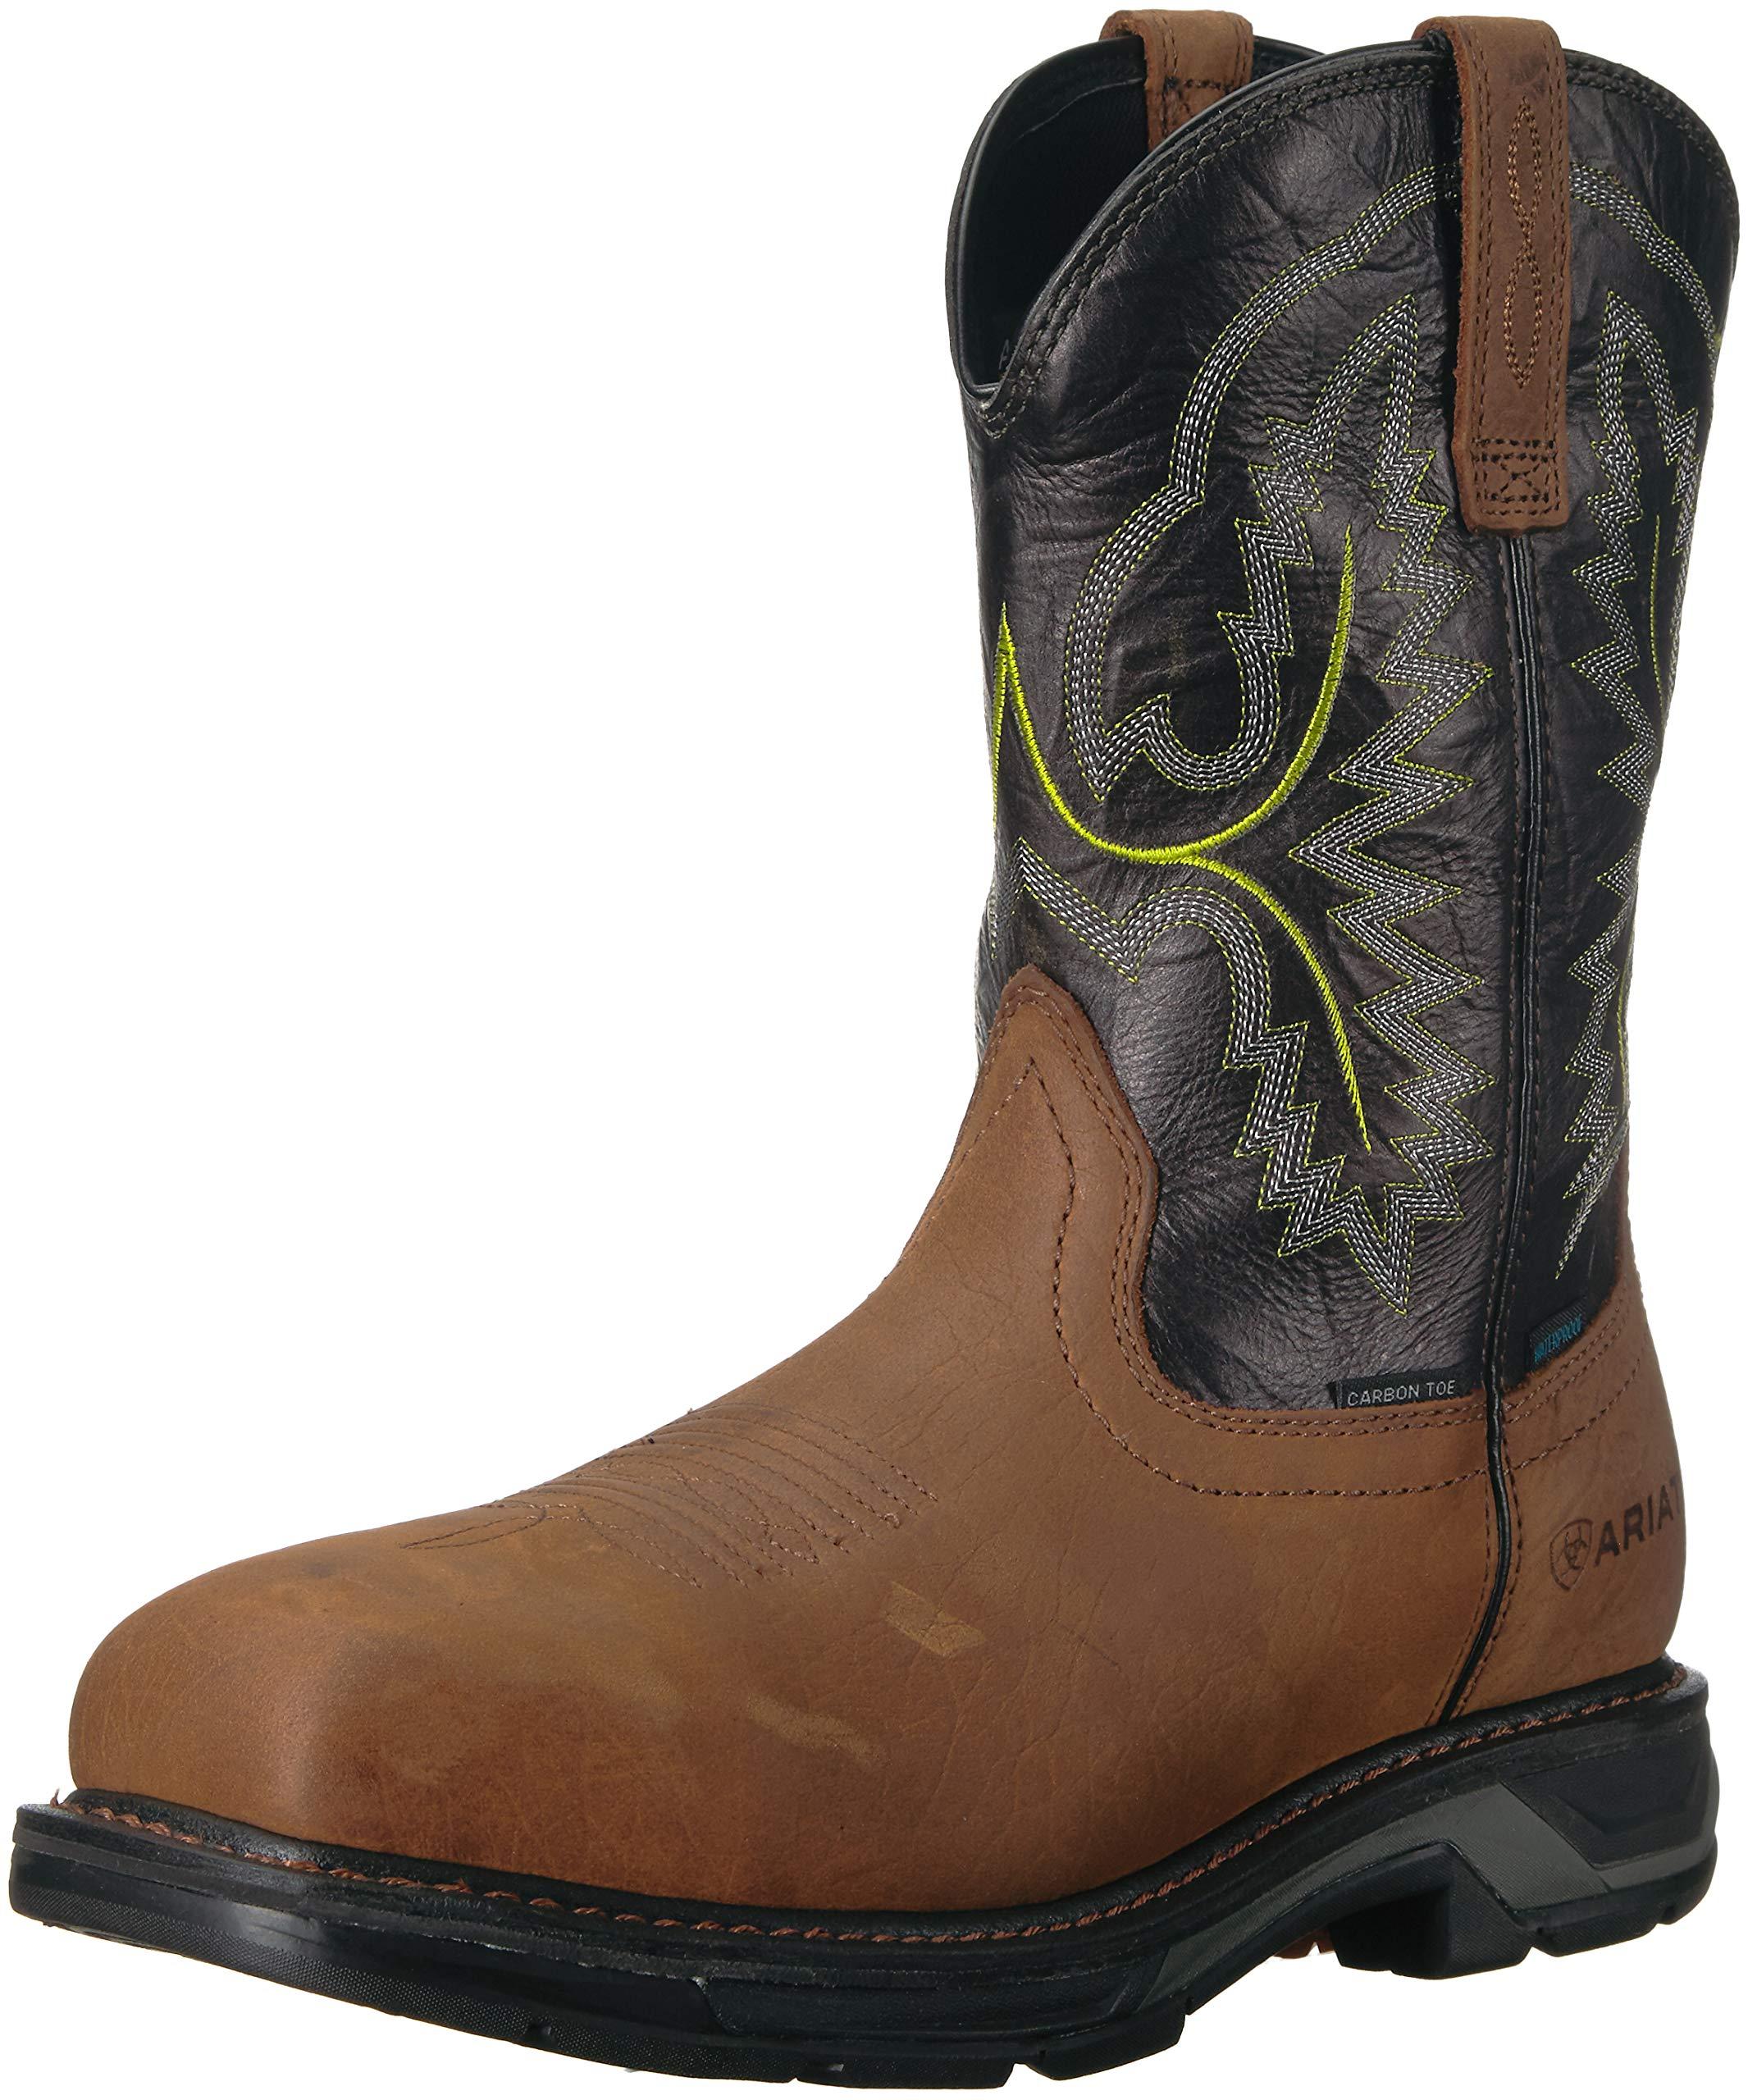 Ariat Work Men's WORKHOG XT H2O CARBON TOE Boot, tumbled bark, 10 2E US